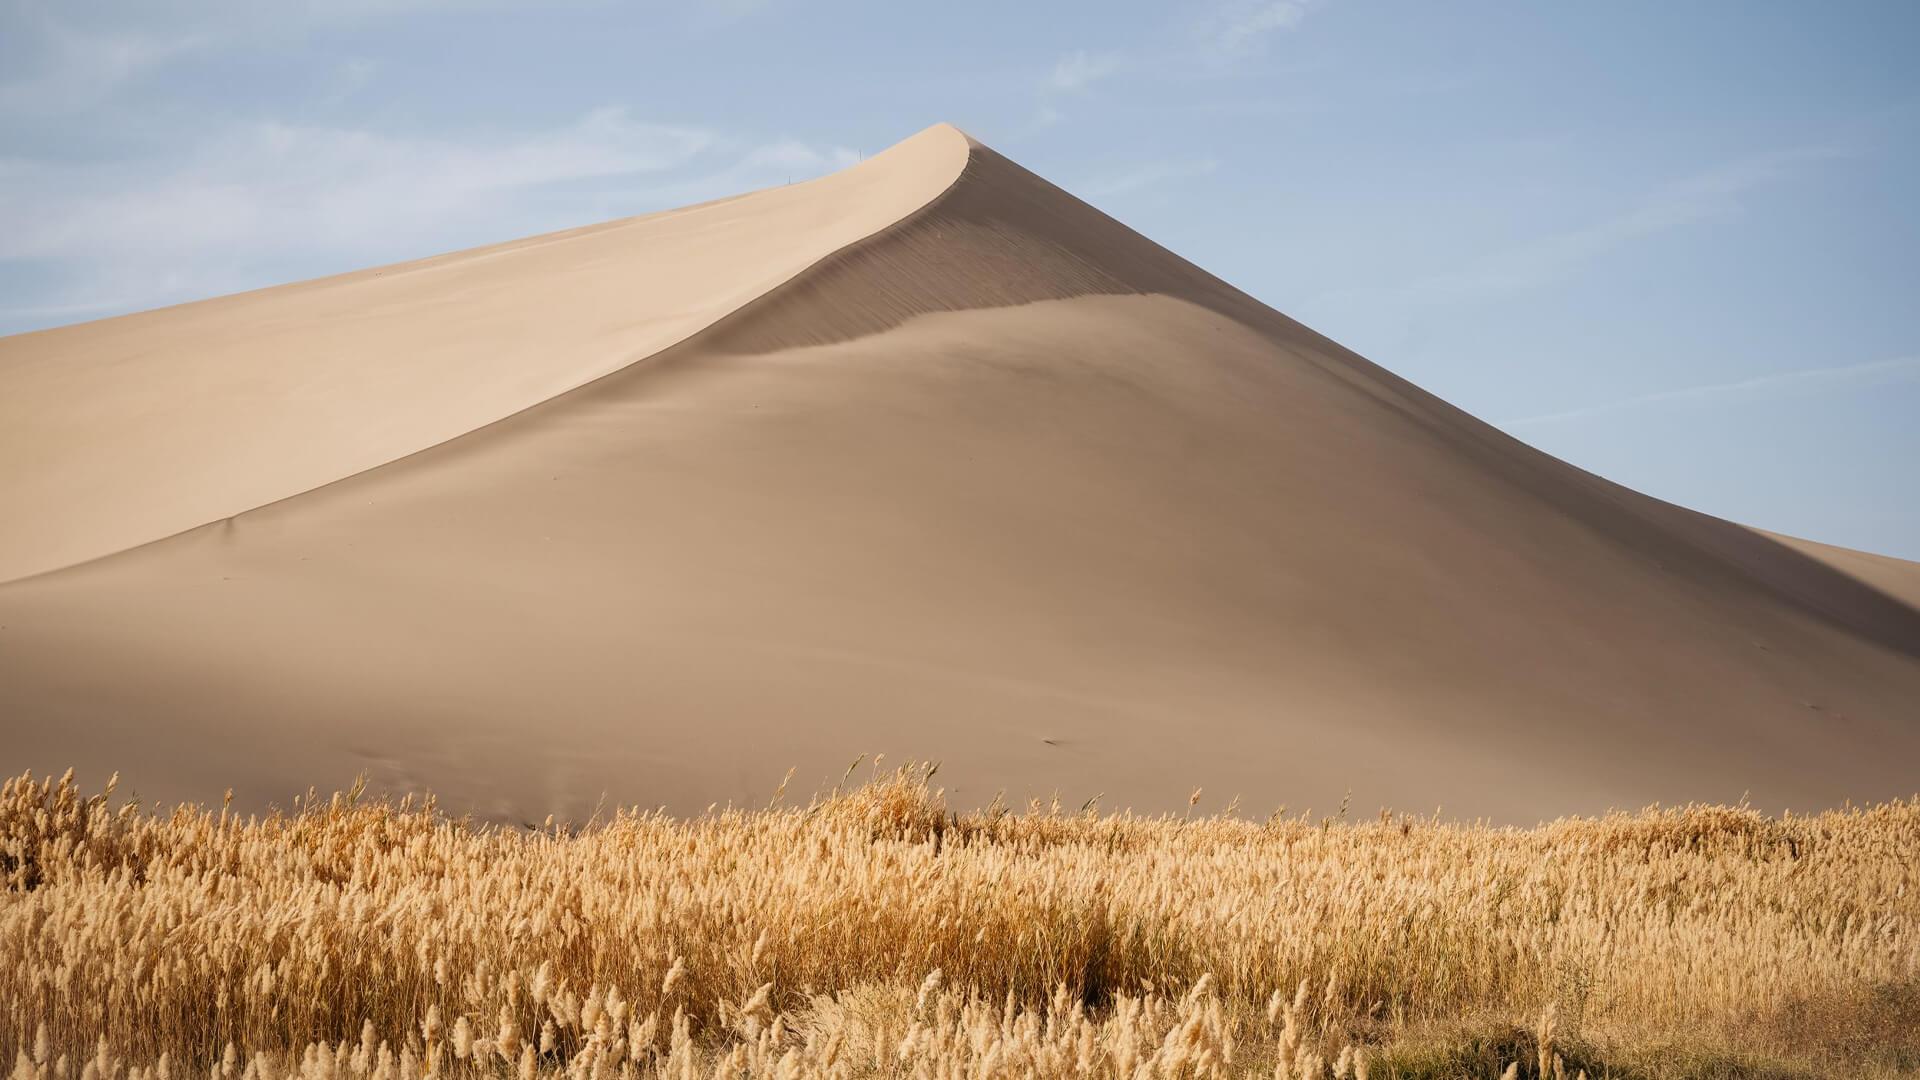 The Gobi Desert at Dunhuang, Central China